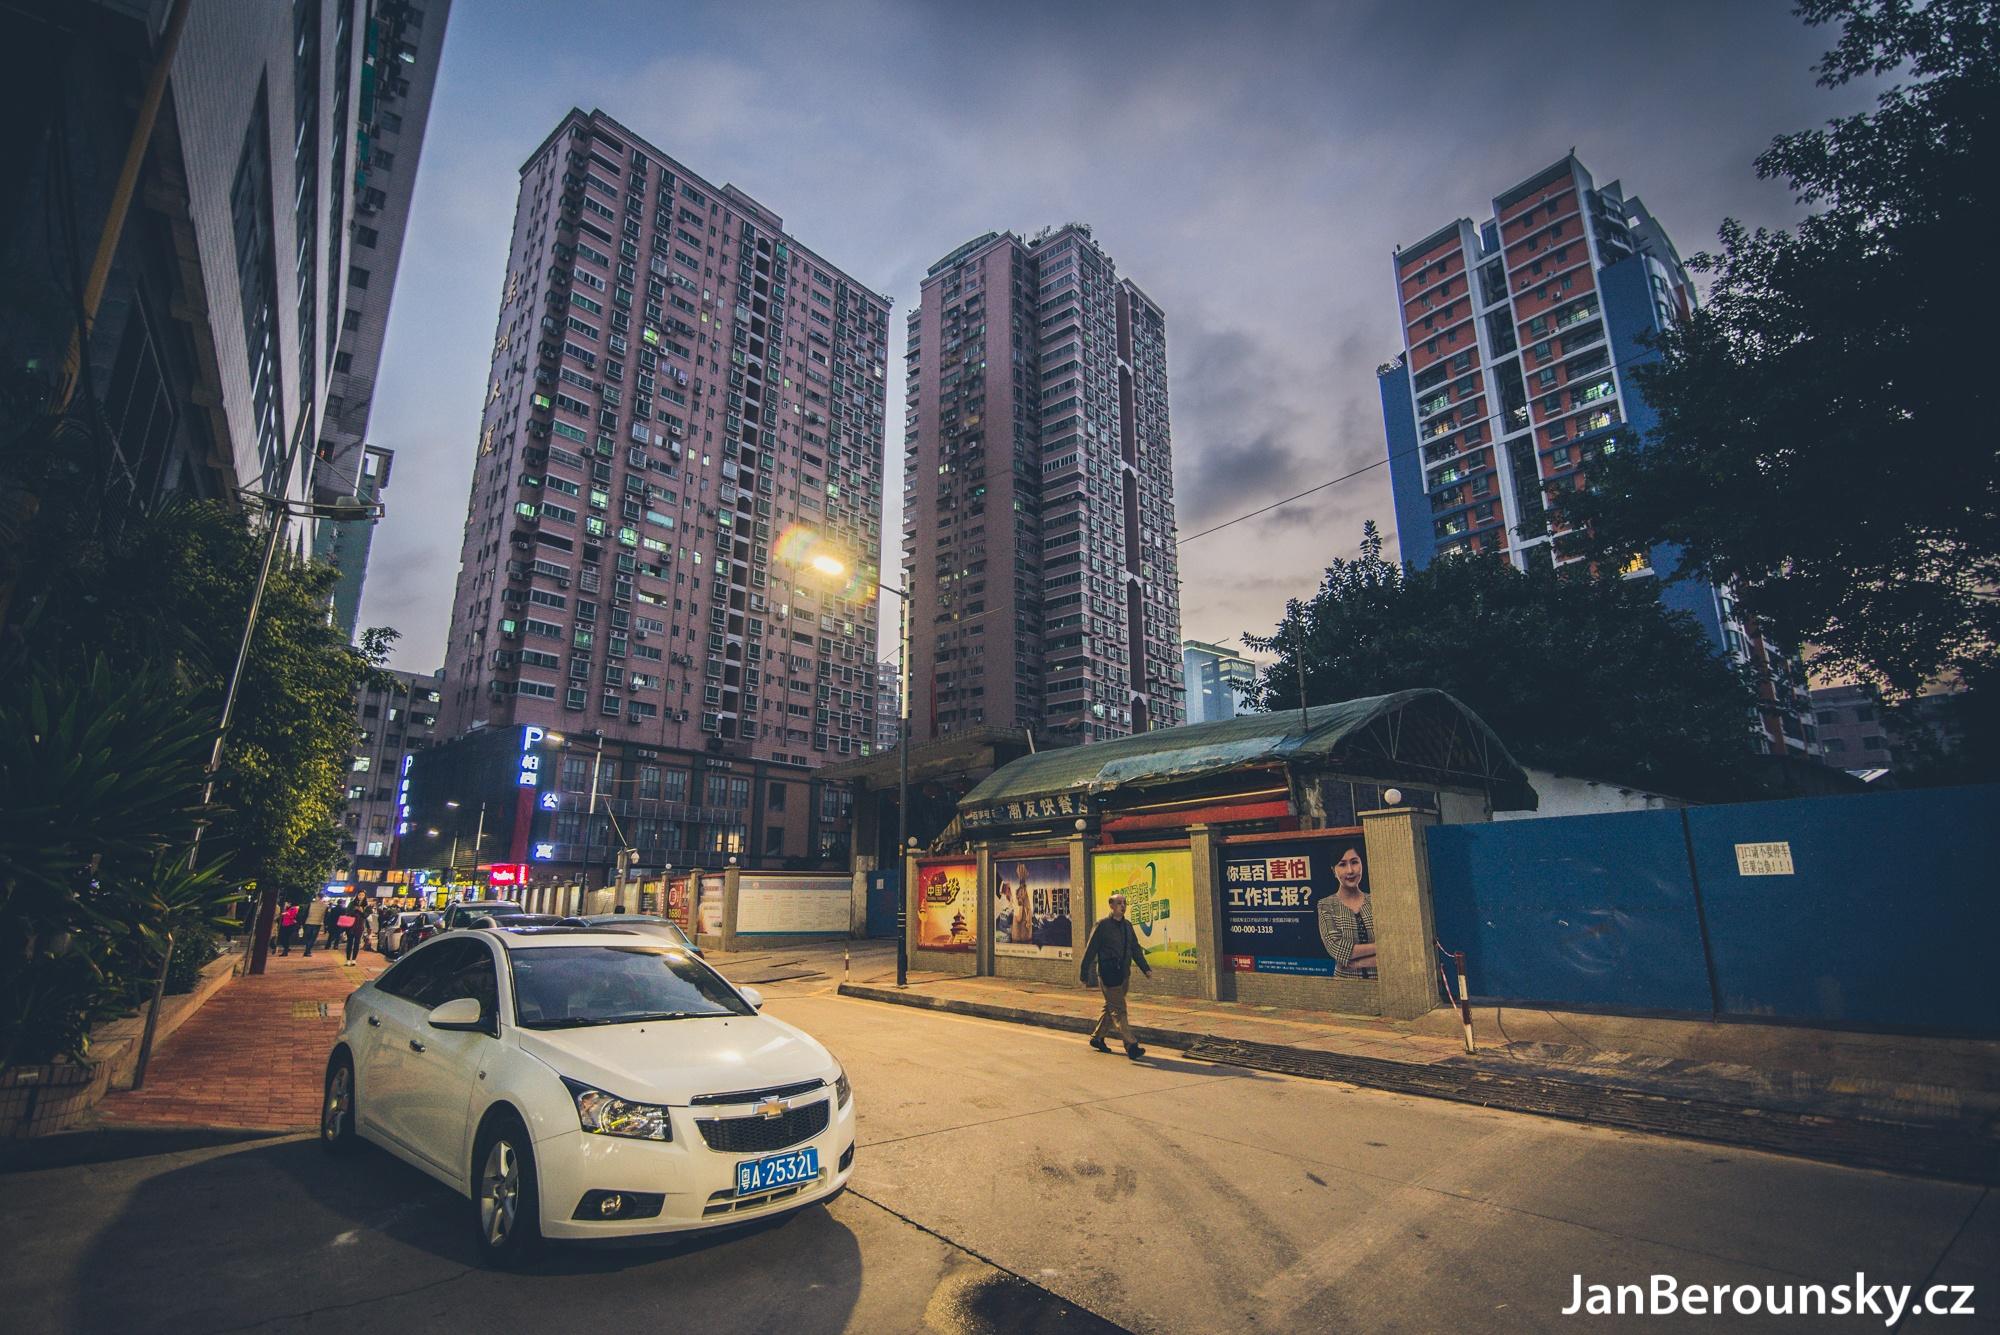 Streets of Guangzhou by Jan Berounský